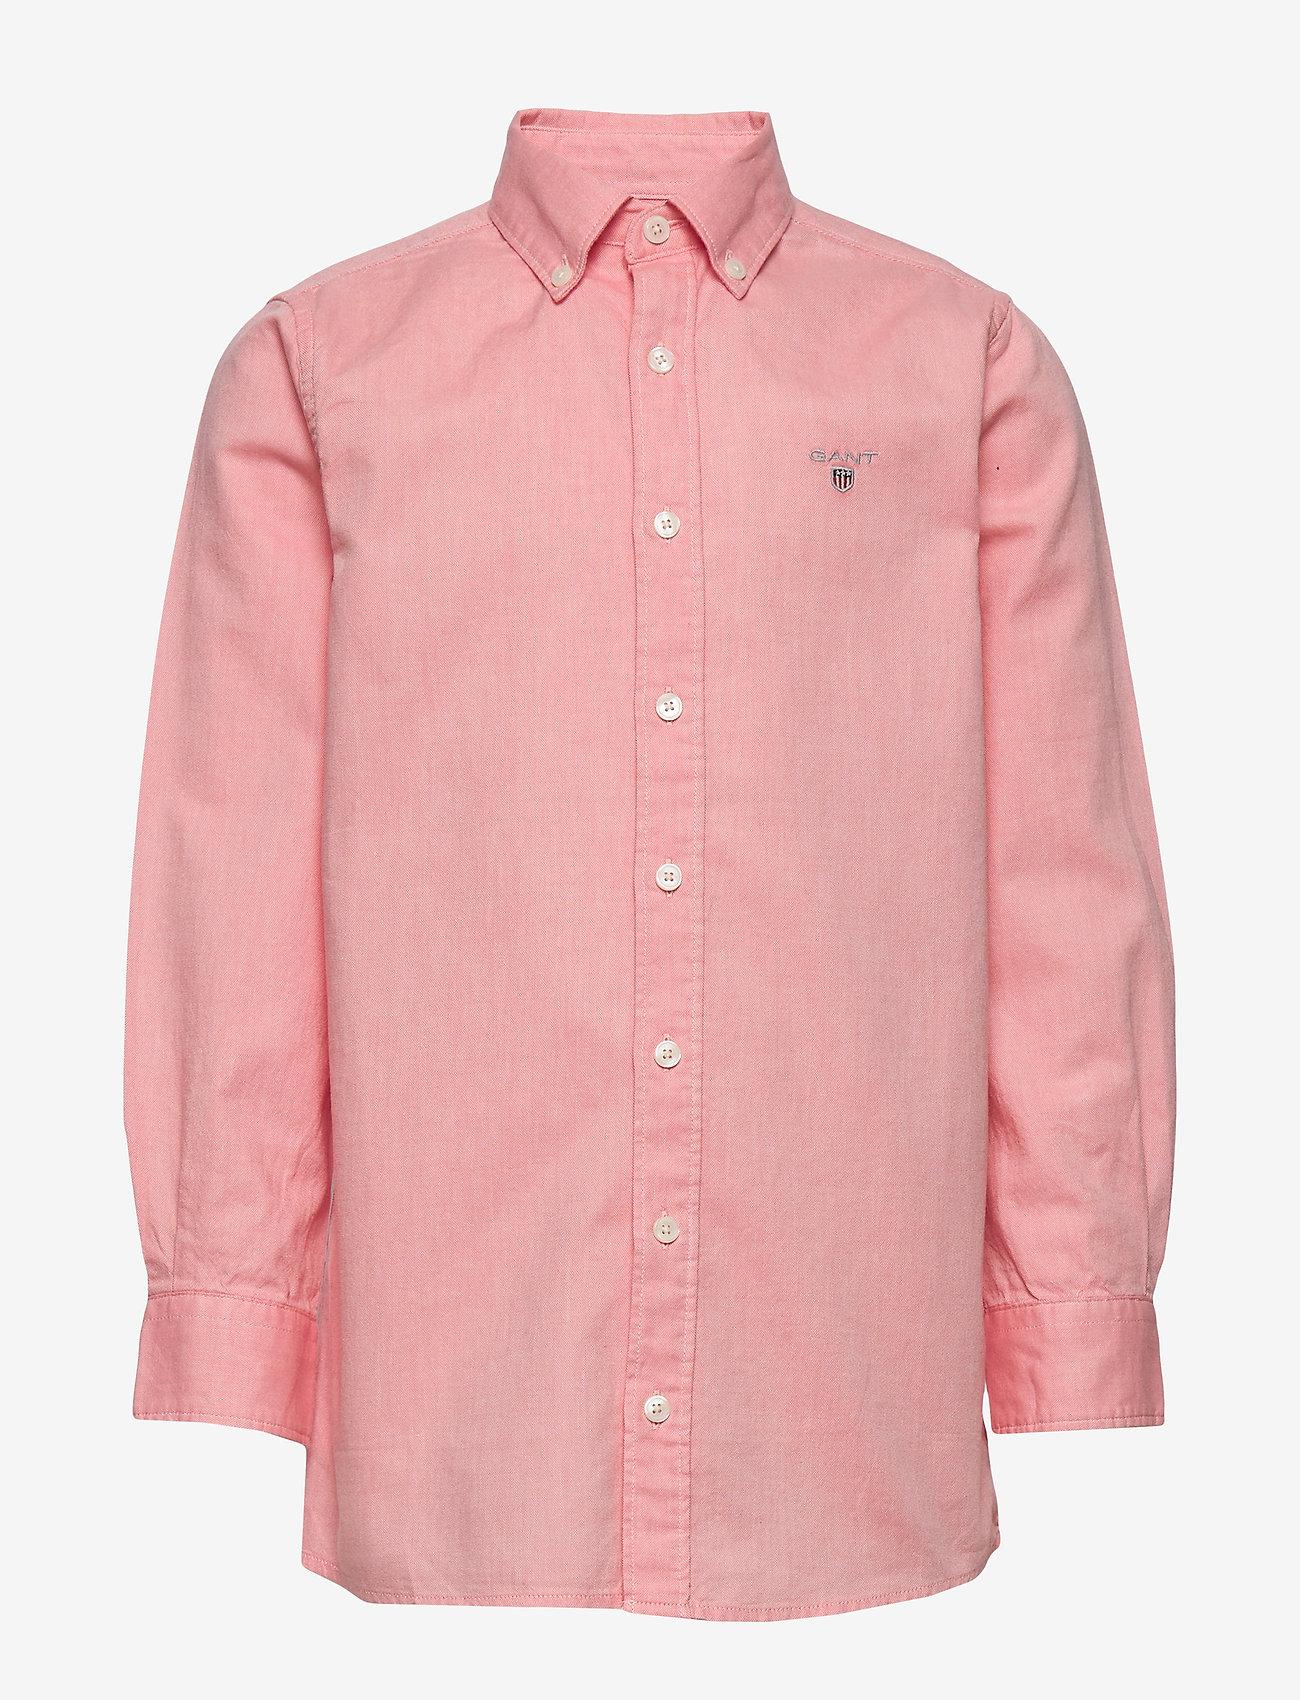 GANT - ARCHIVE OXFORD B.D SHIRT - hemden - strawberry pink - 0